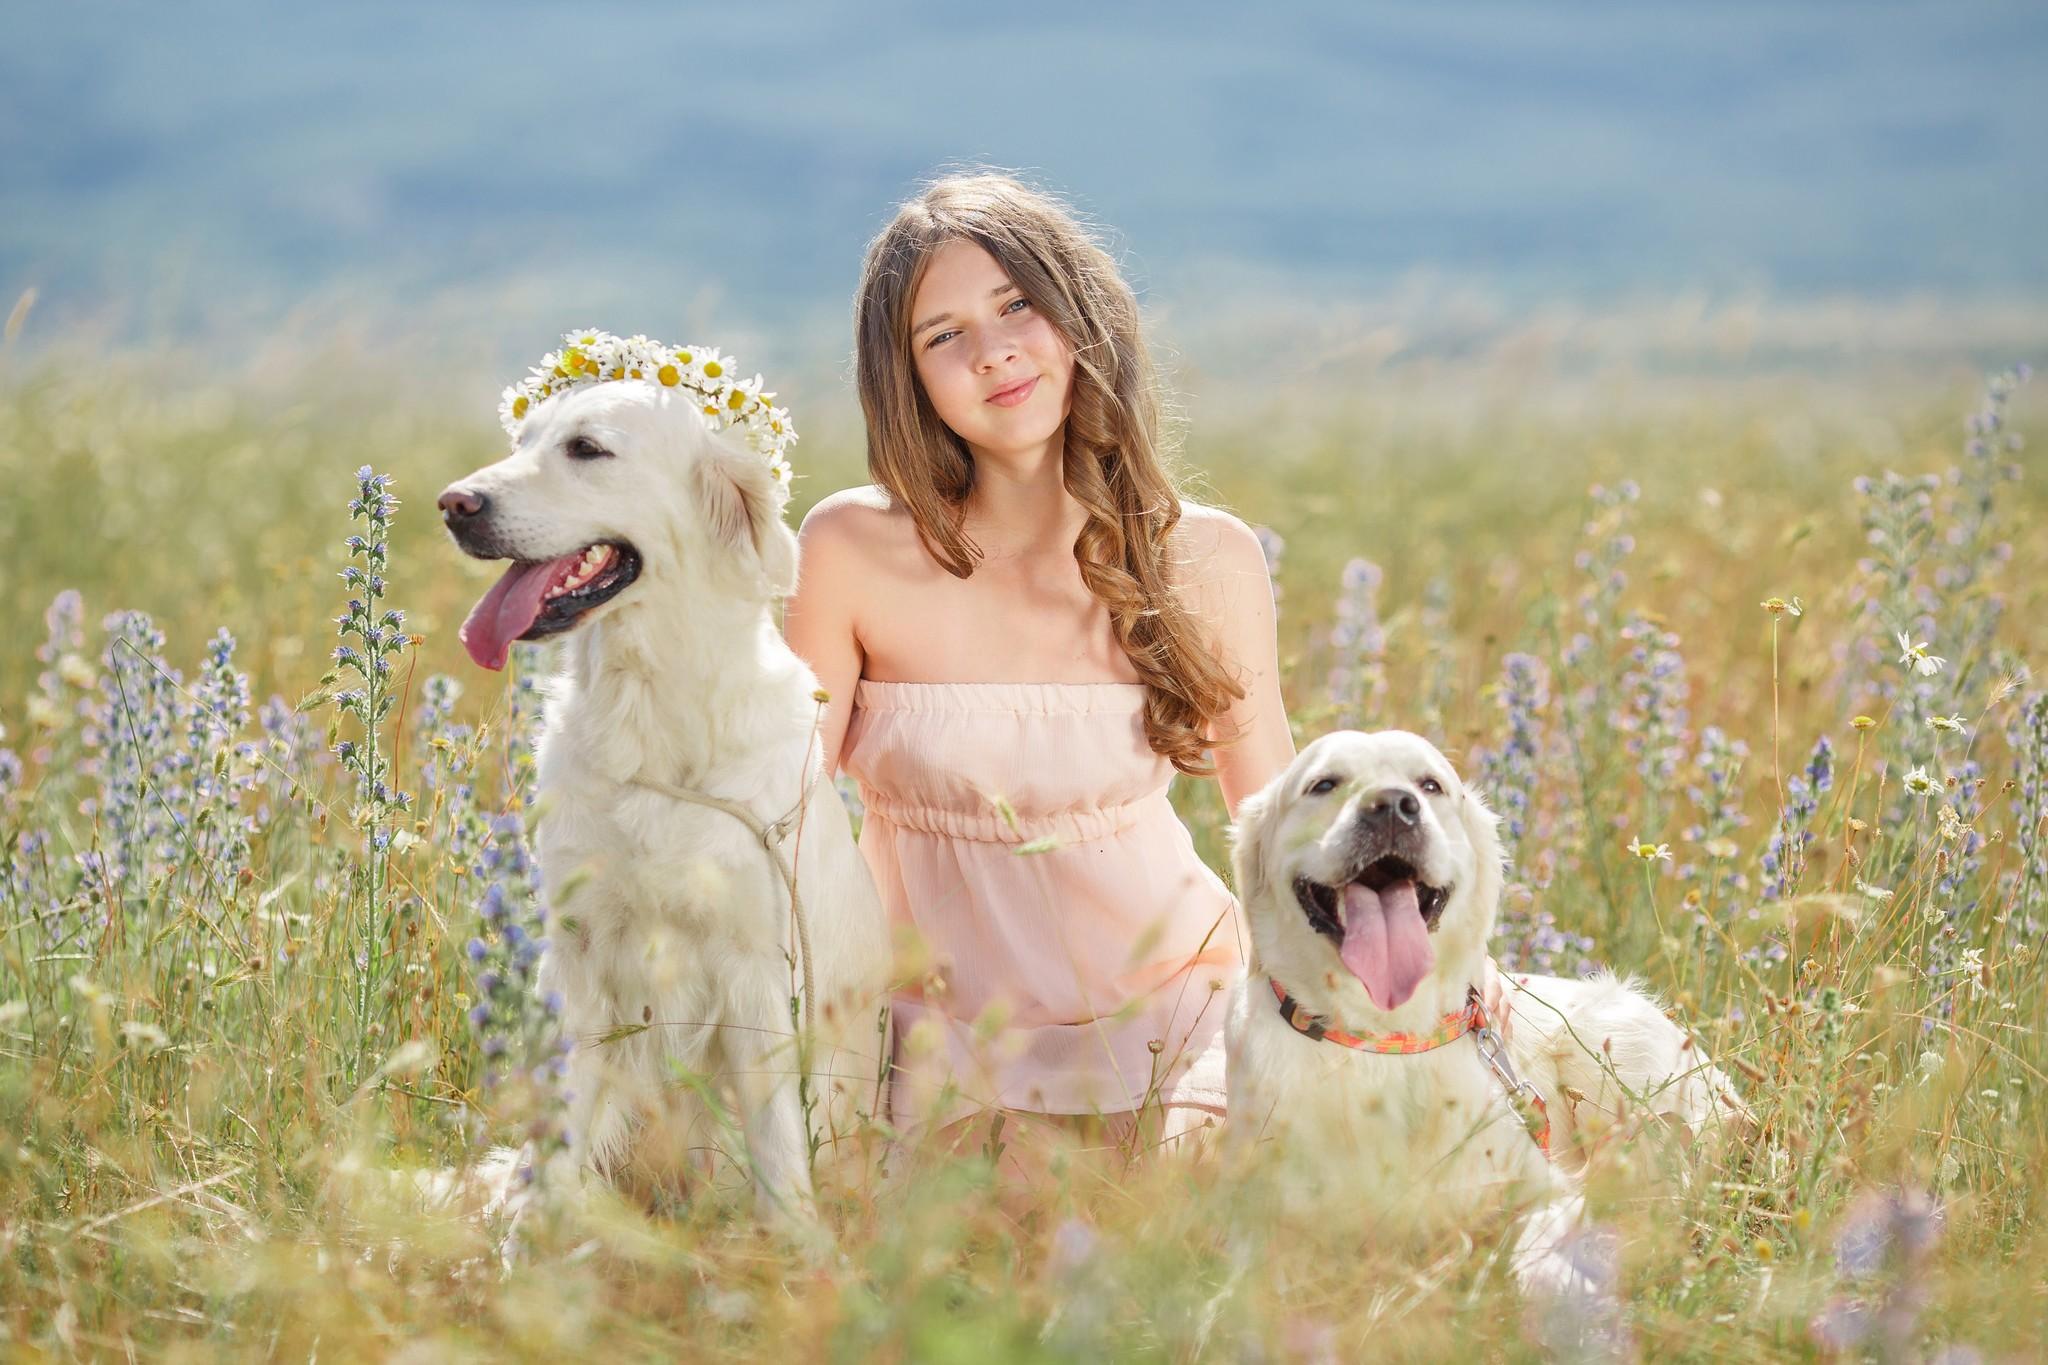 Фото для жены животных